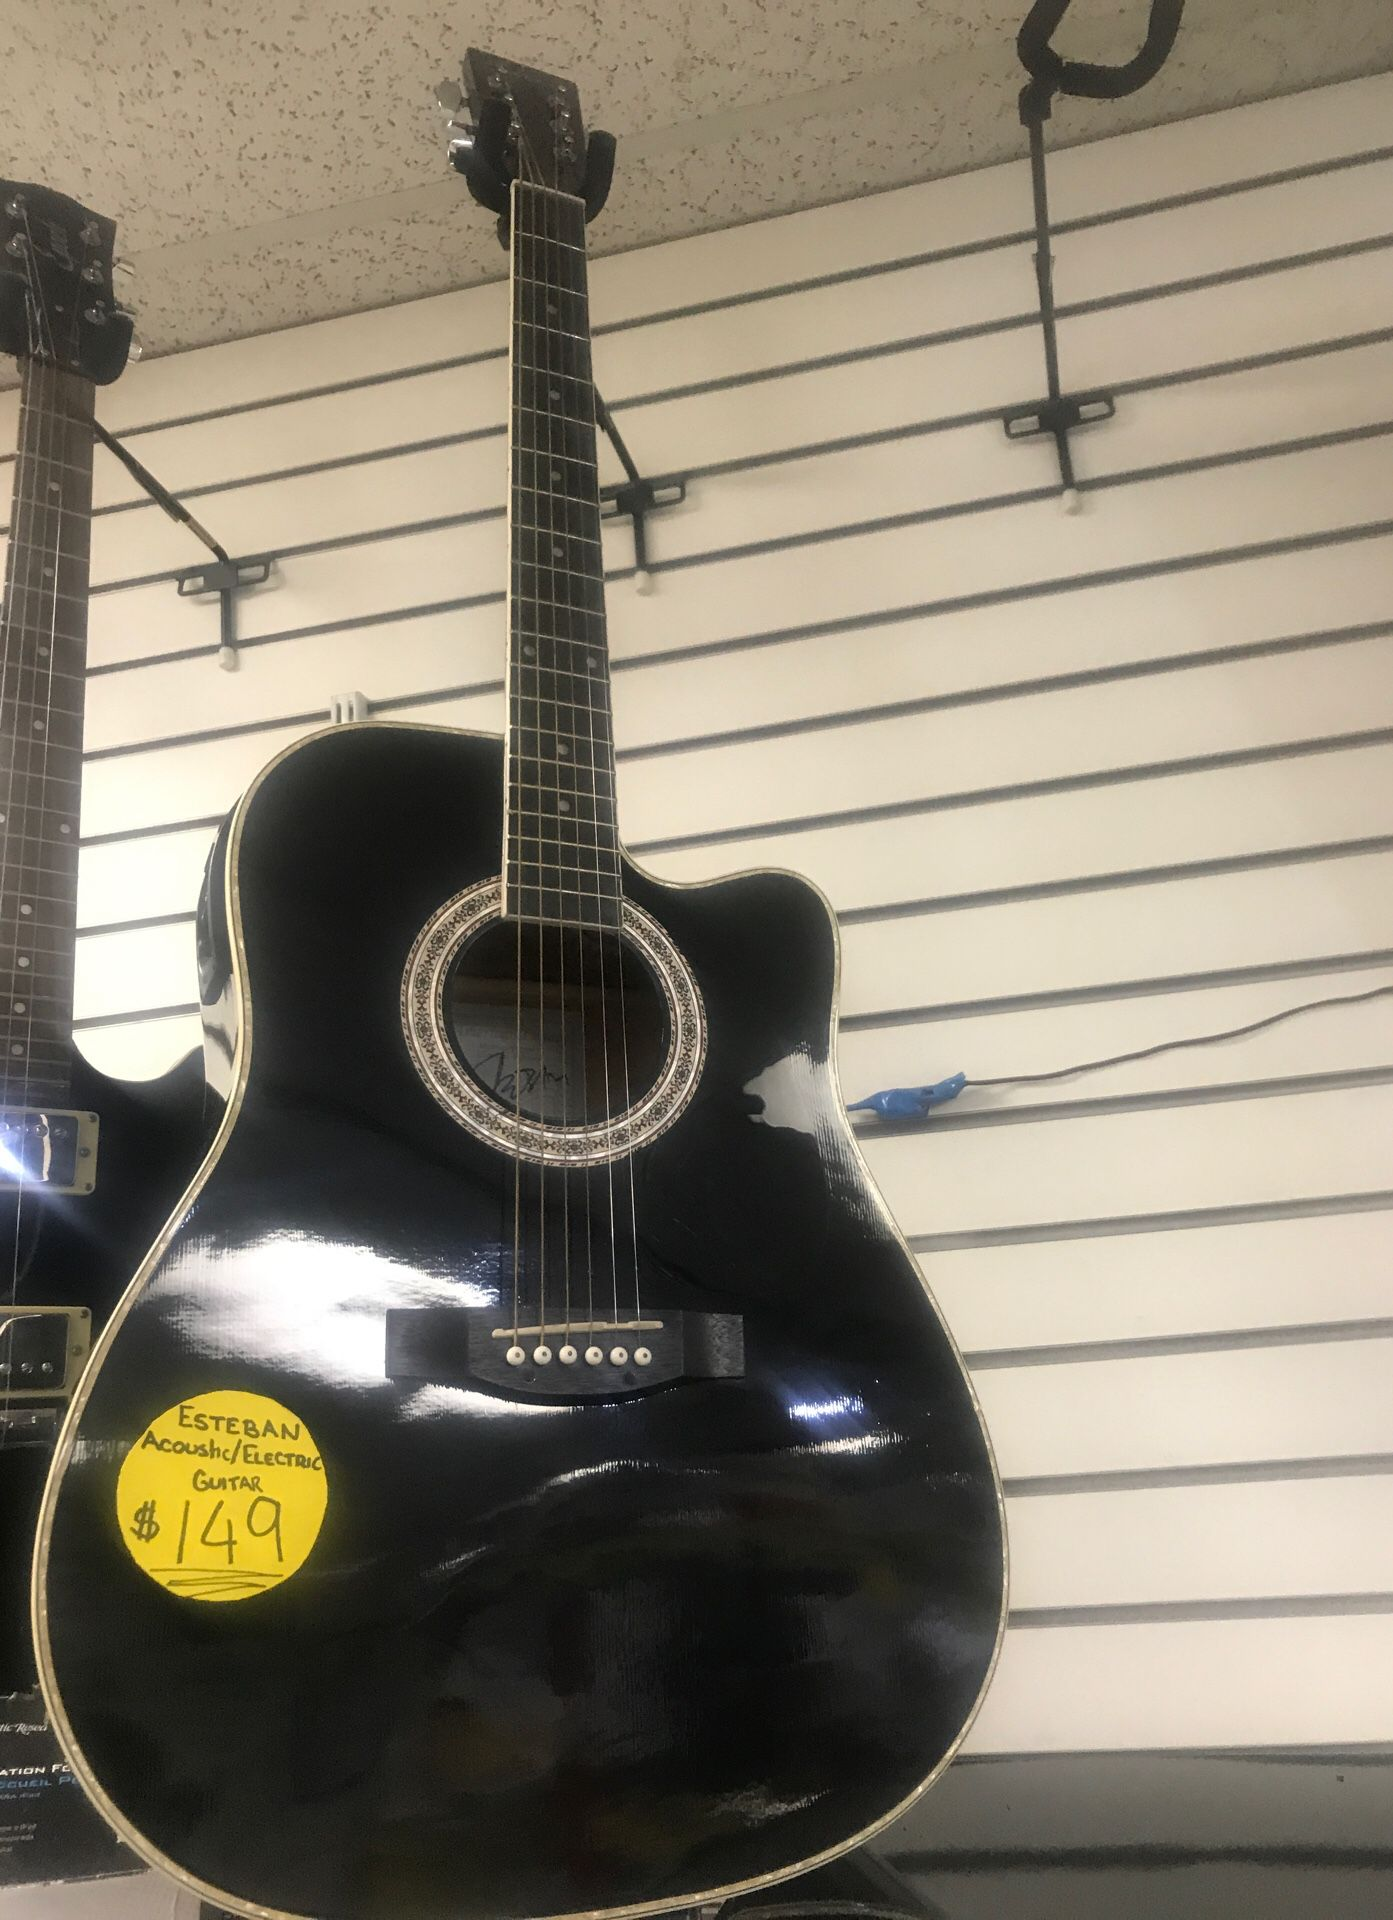 Esteban acoustic/electric guitar